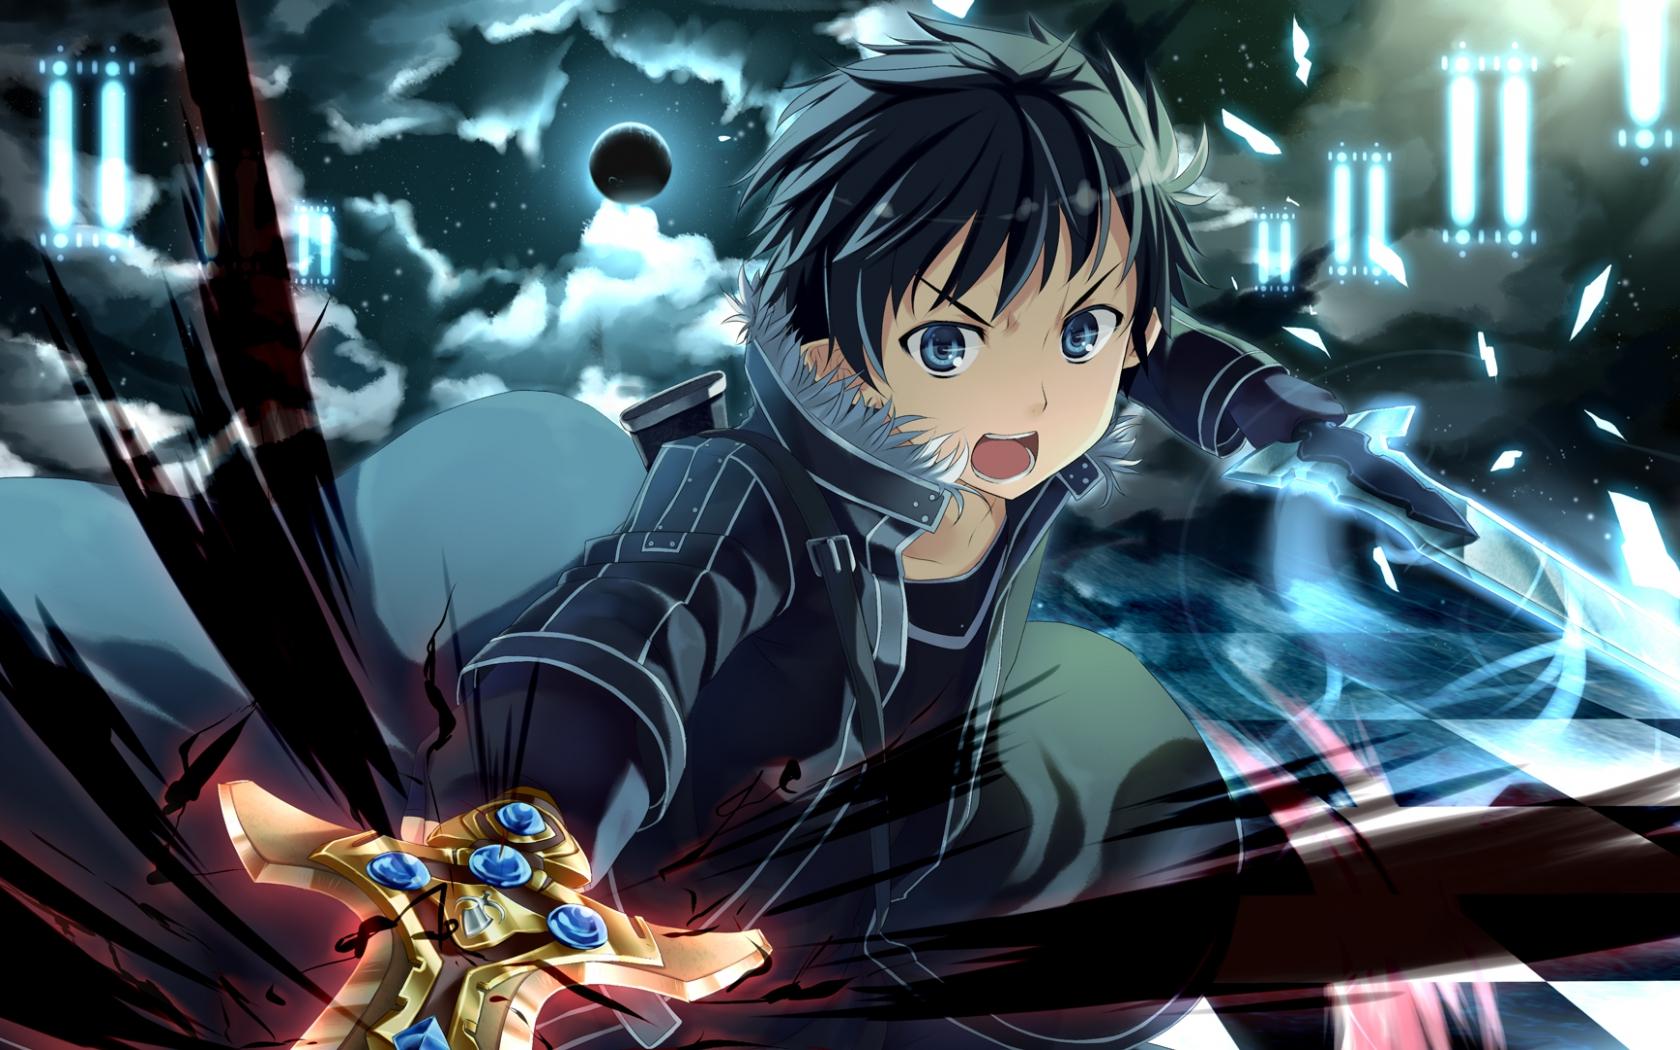 Anime Sword Art Online Kazuto Kiri A Kirito Sword Art Online Wallpaper Download